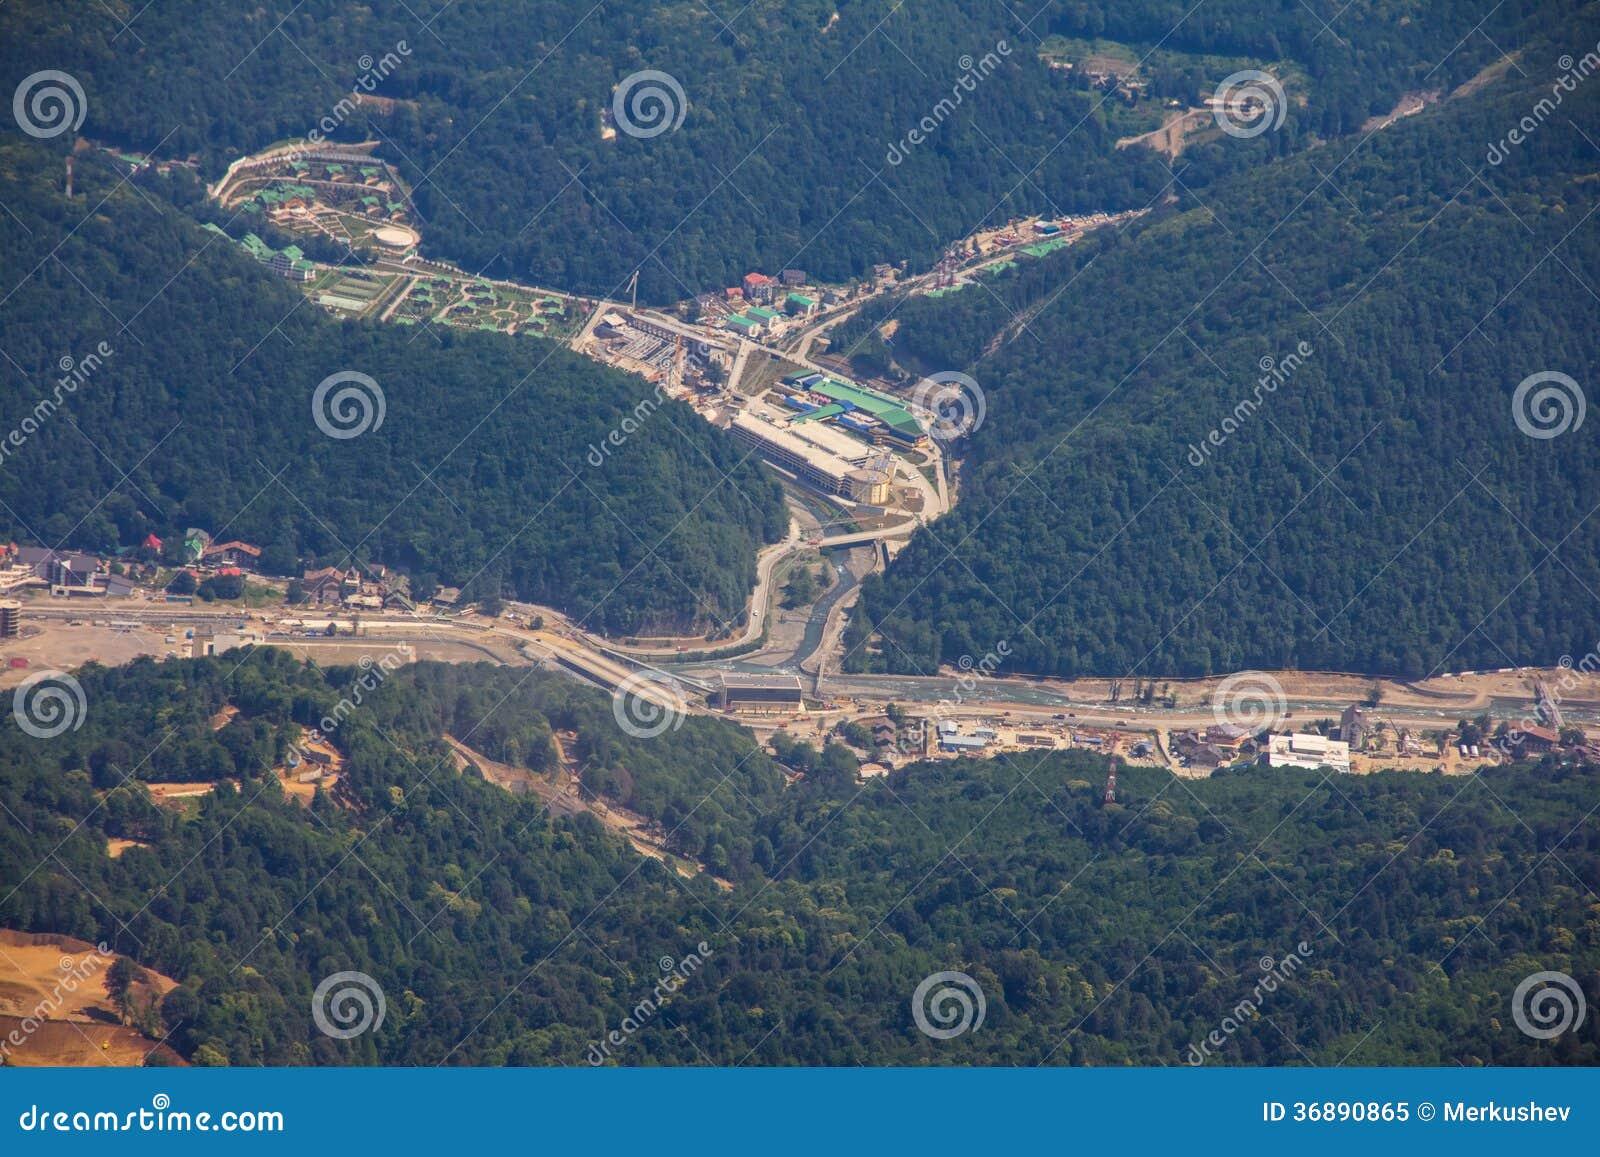 Download Vista Superiore Di Krasnaya Polyana, Soci, Russia. Immagine Stock - Immagine di legno, preparisi: 36890865